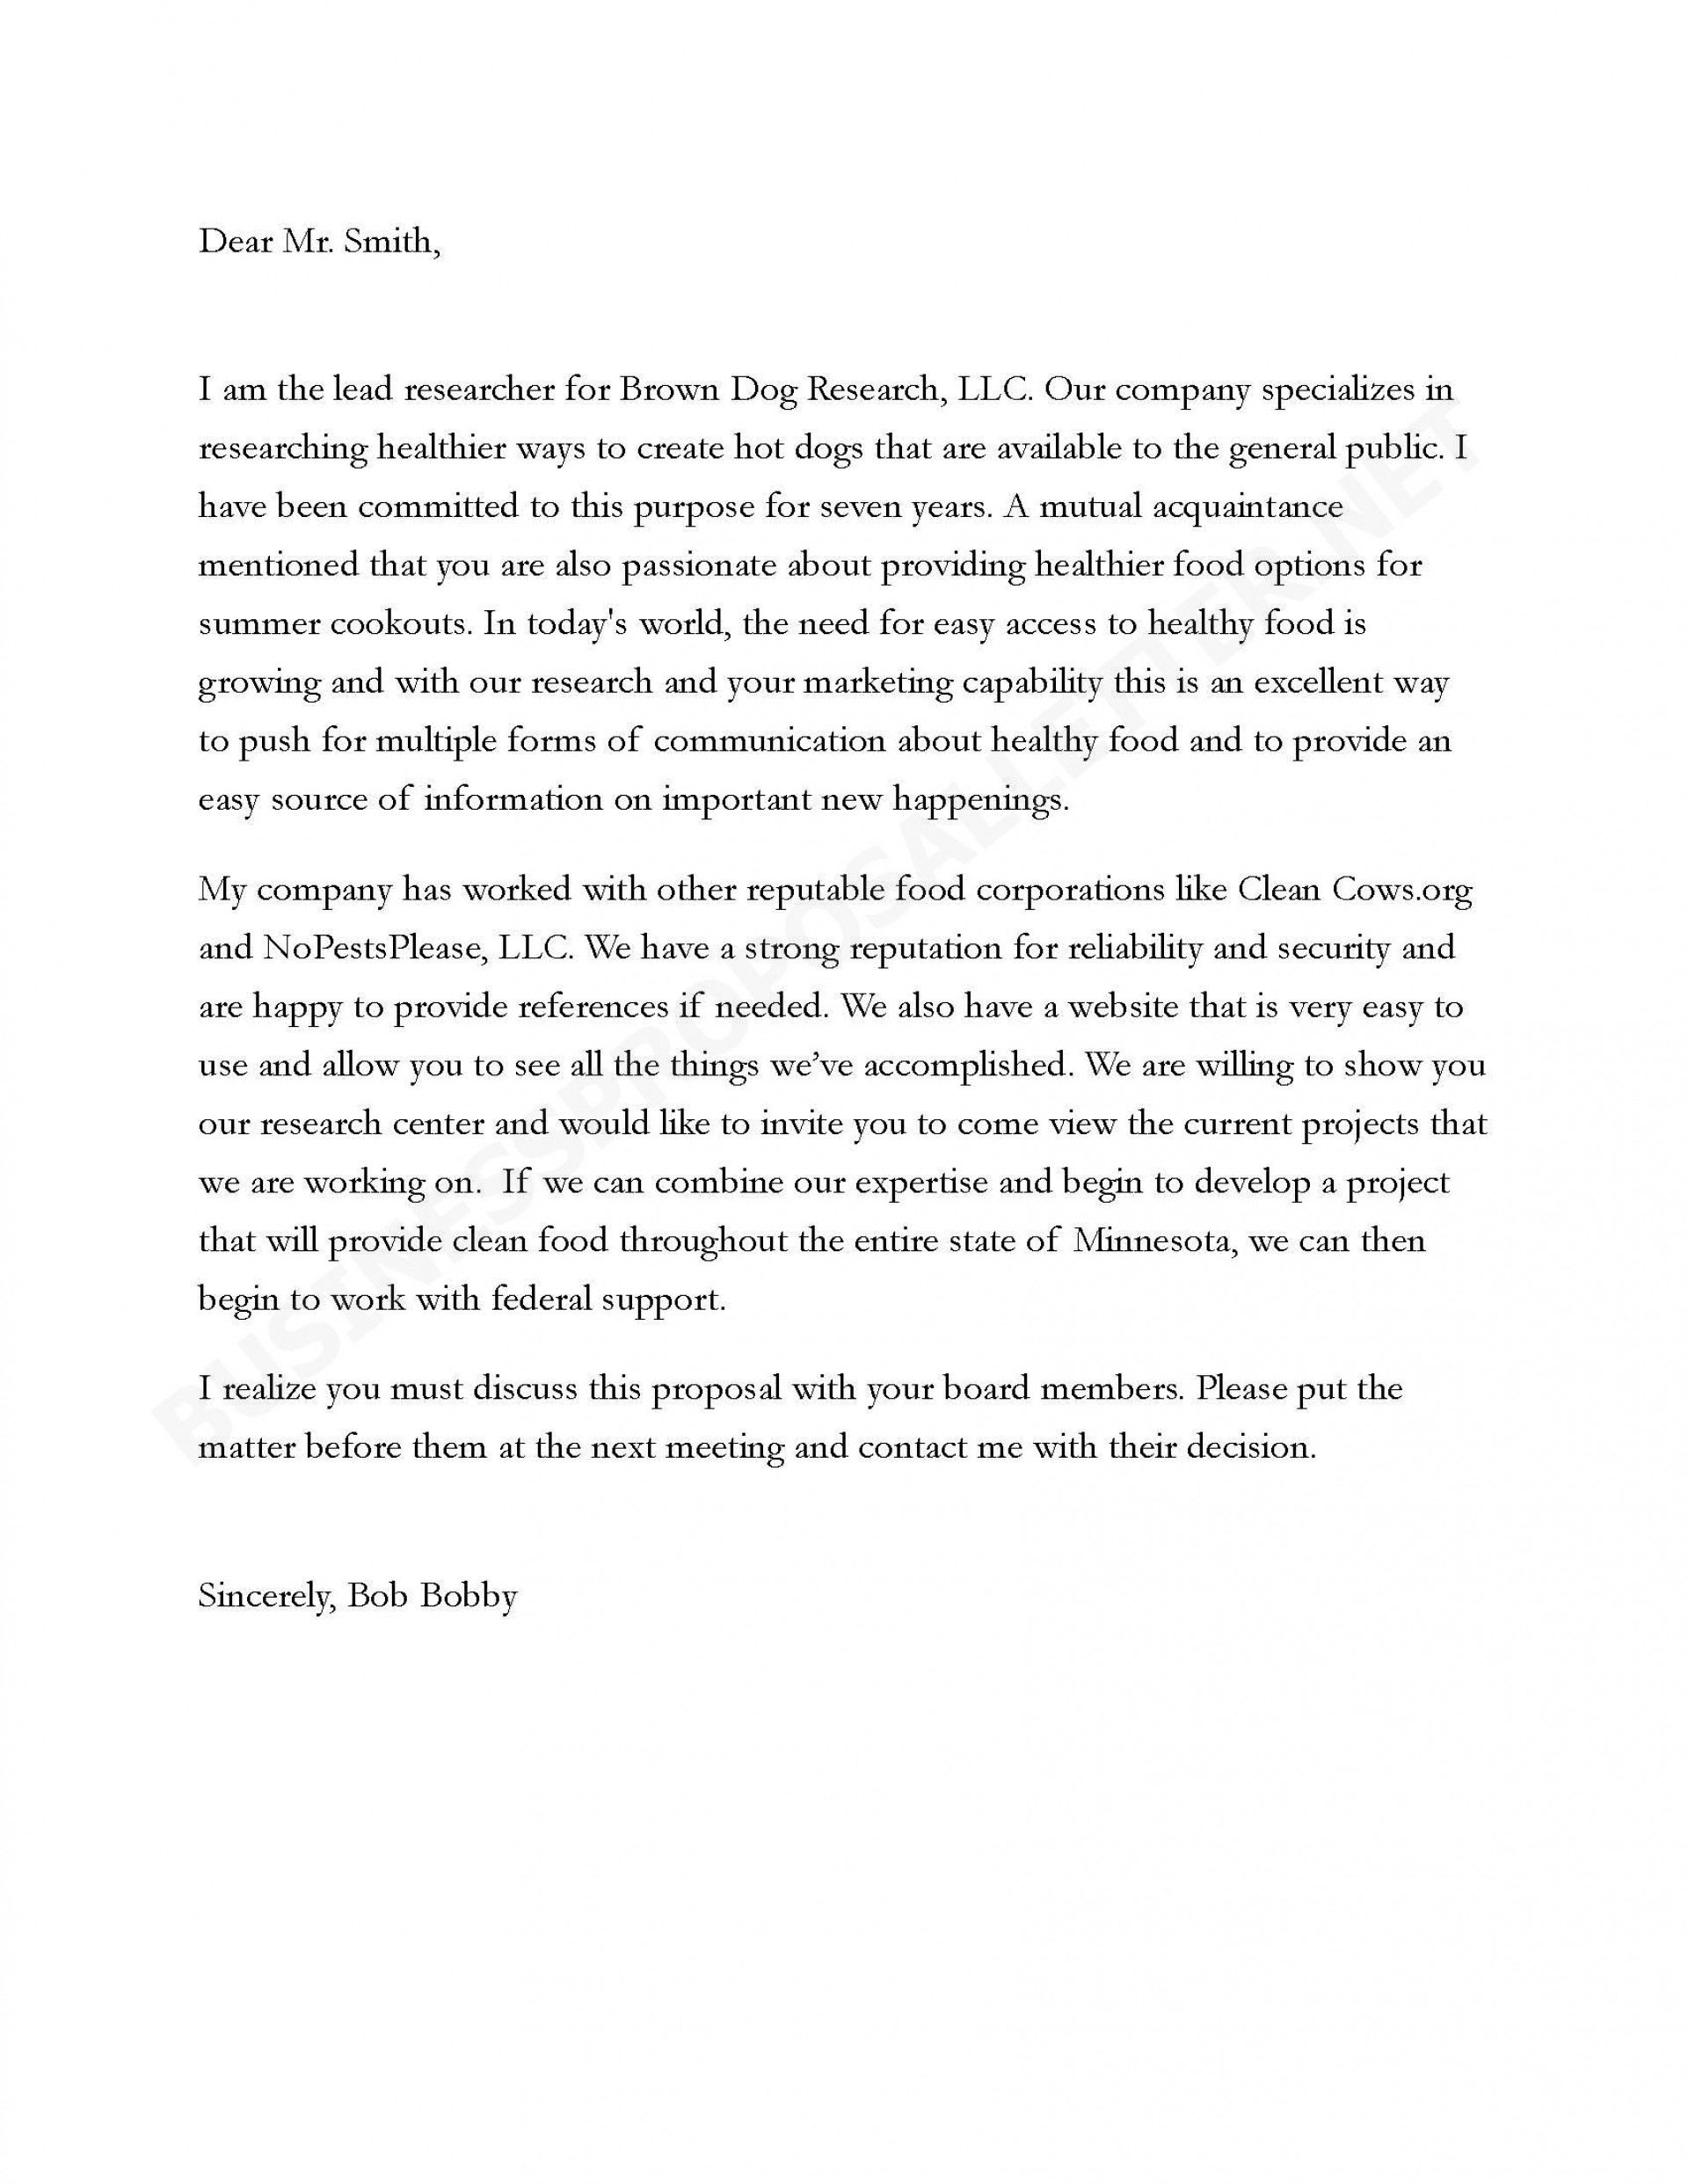 005 Essay Proposal Business Letter Sample Top Samples Mla Format Satirical Ideas 1920